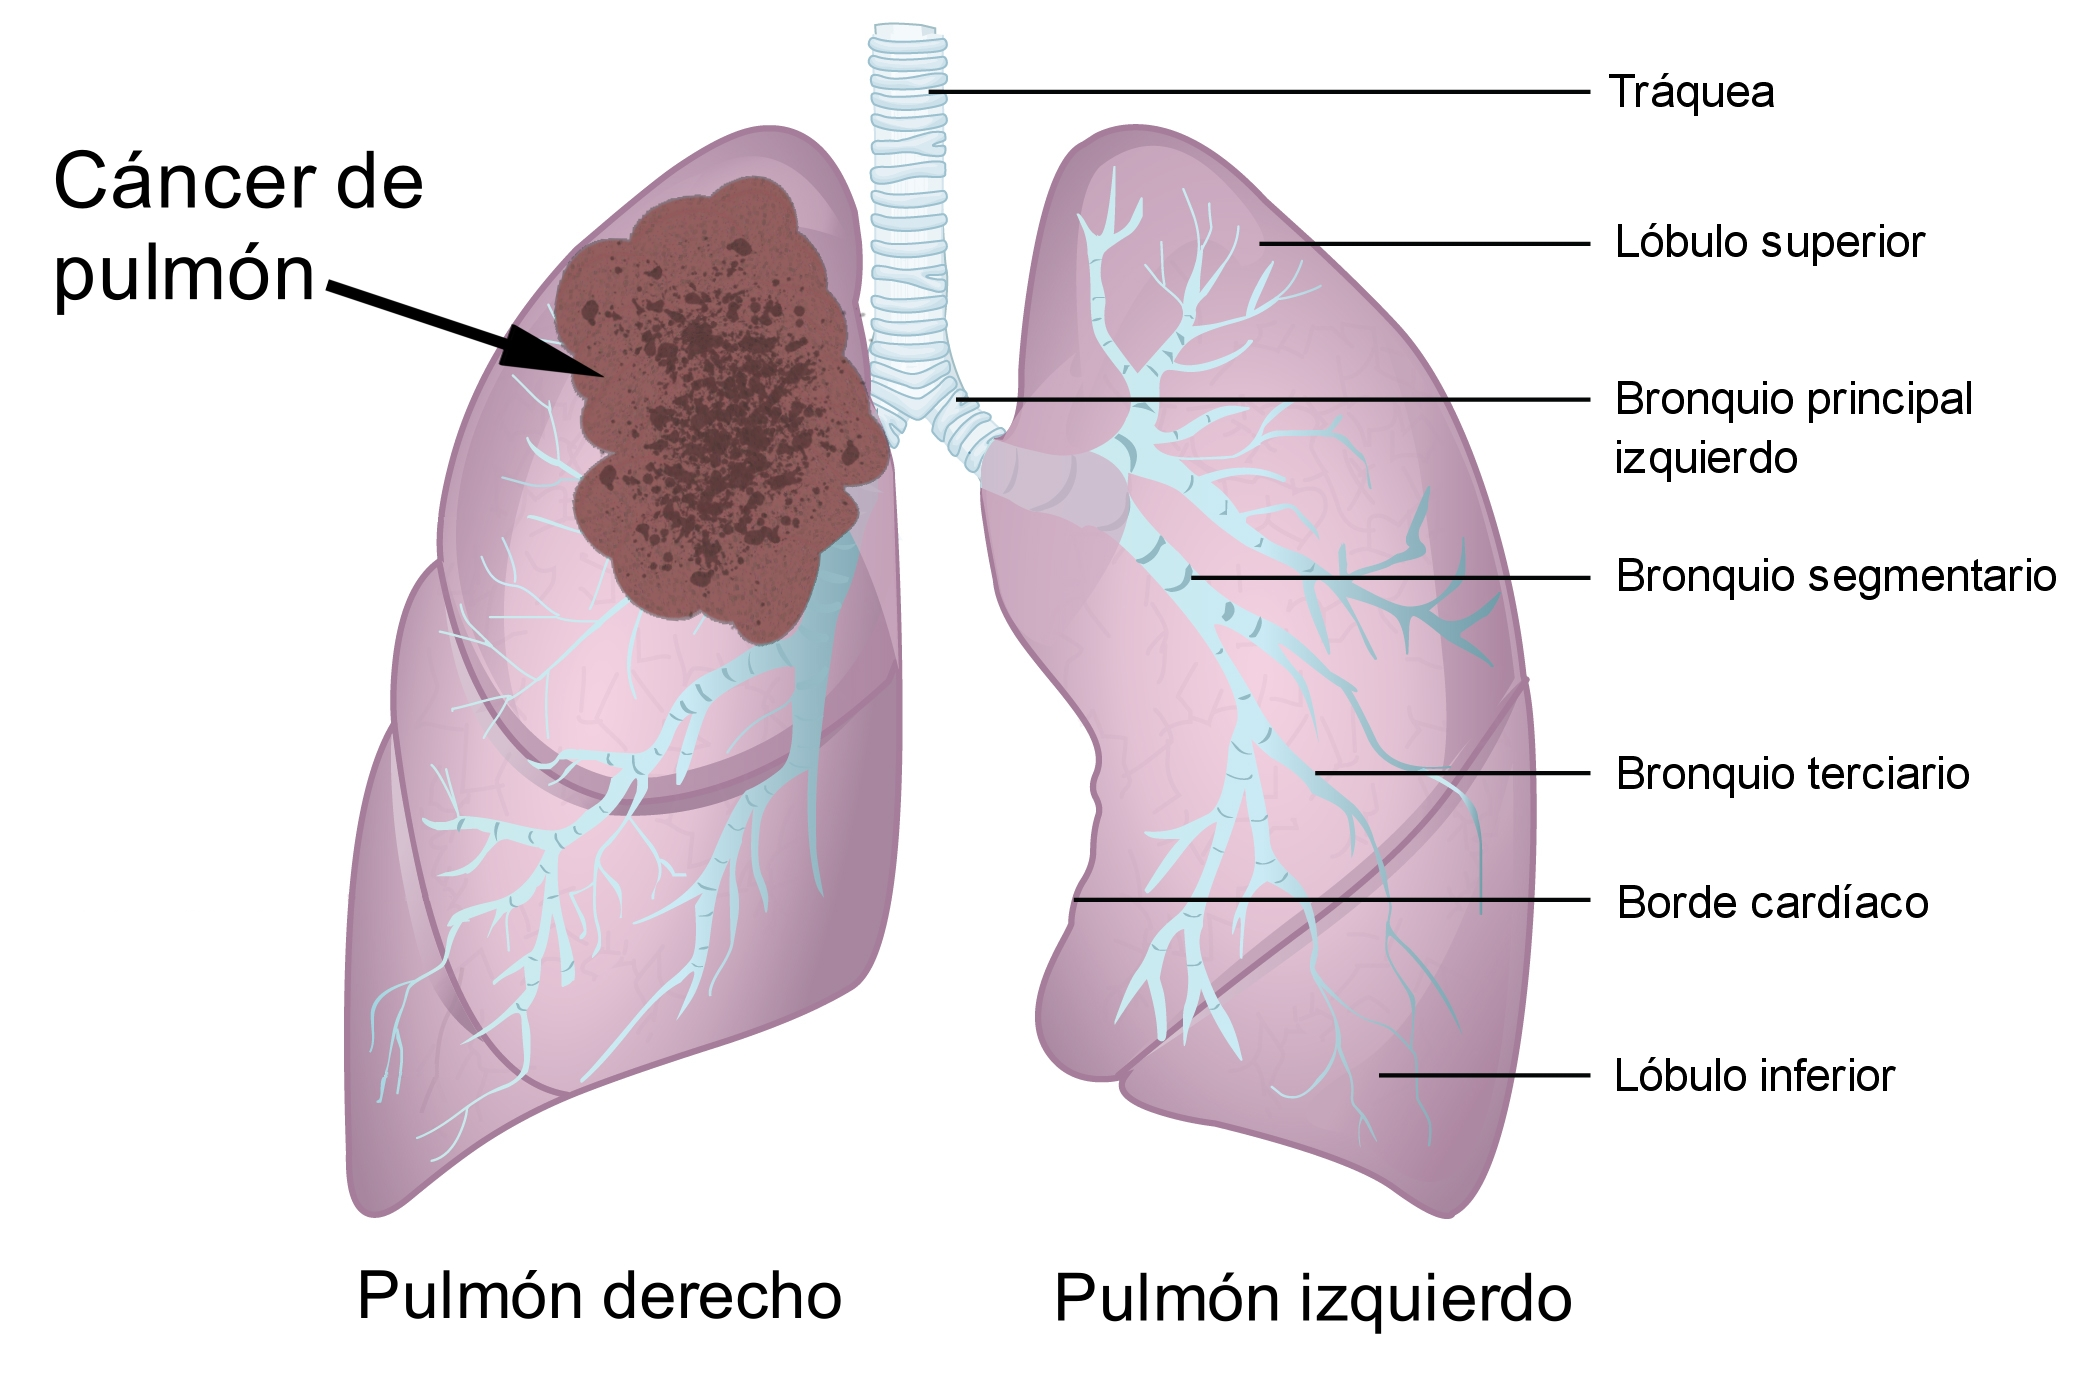 cancer neoplasia maligna